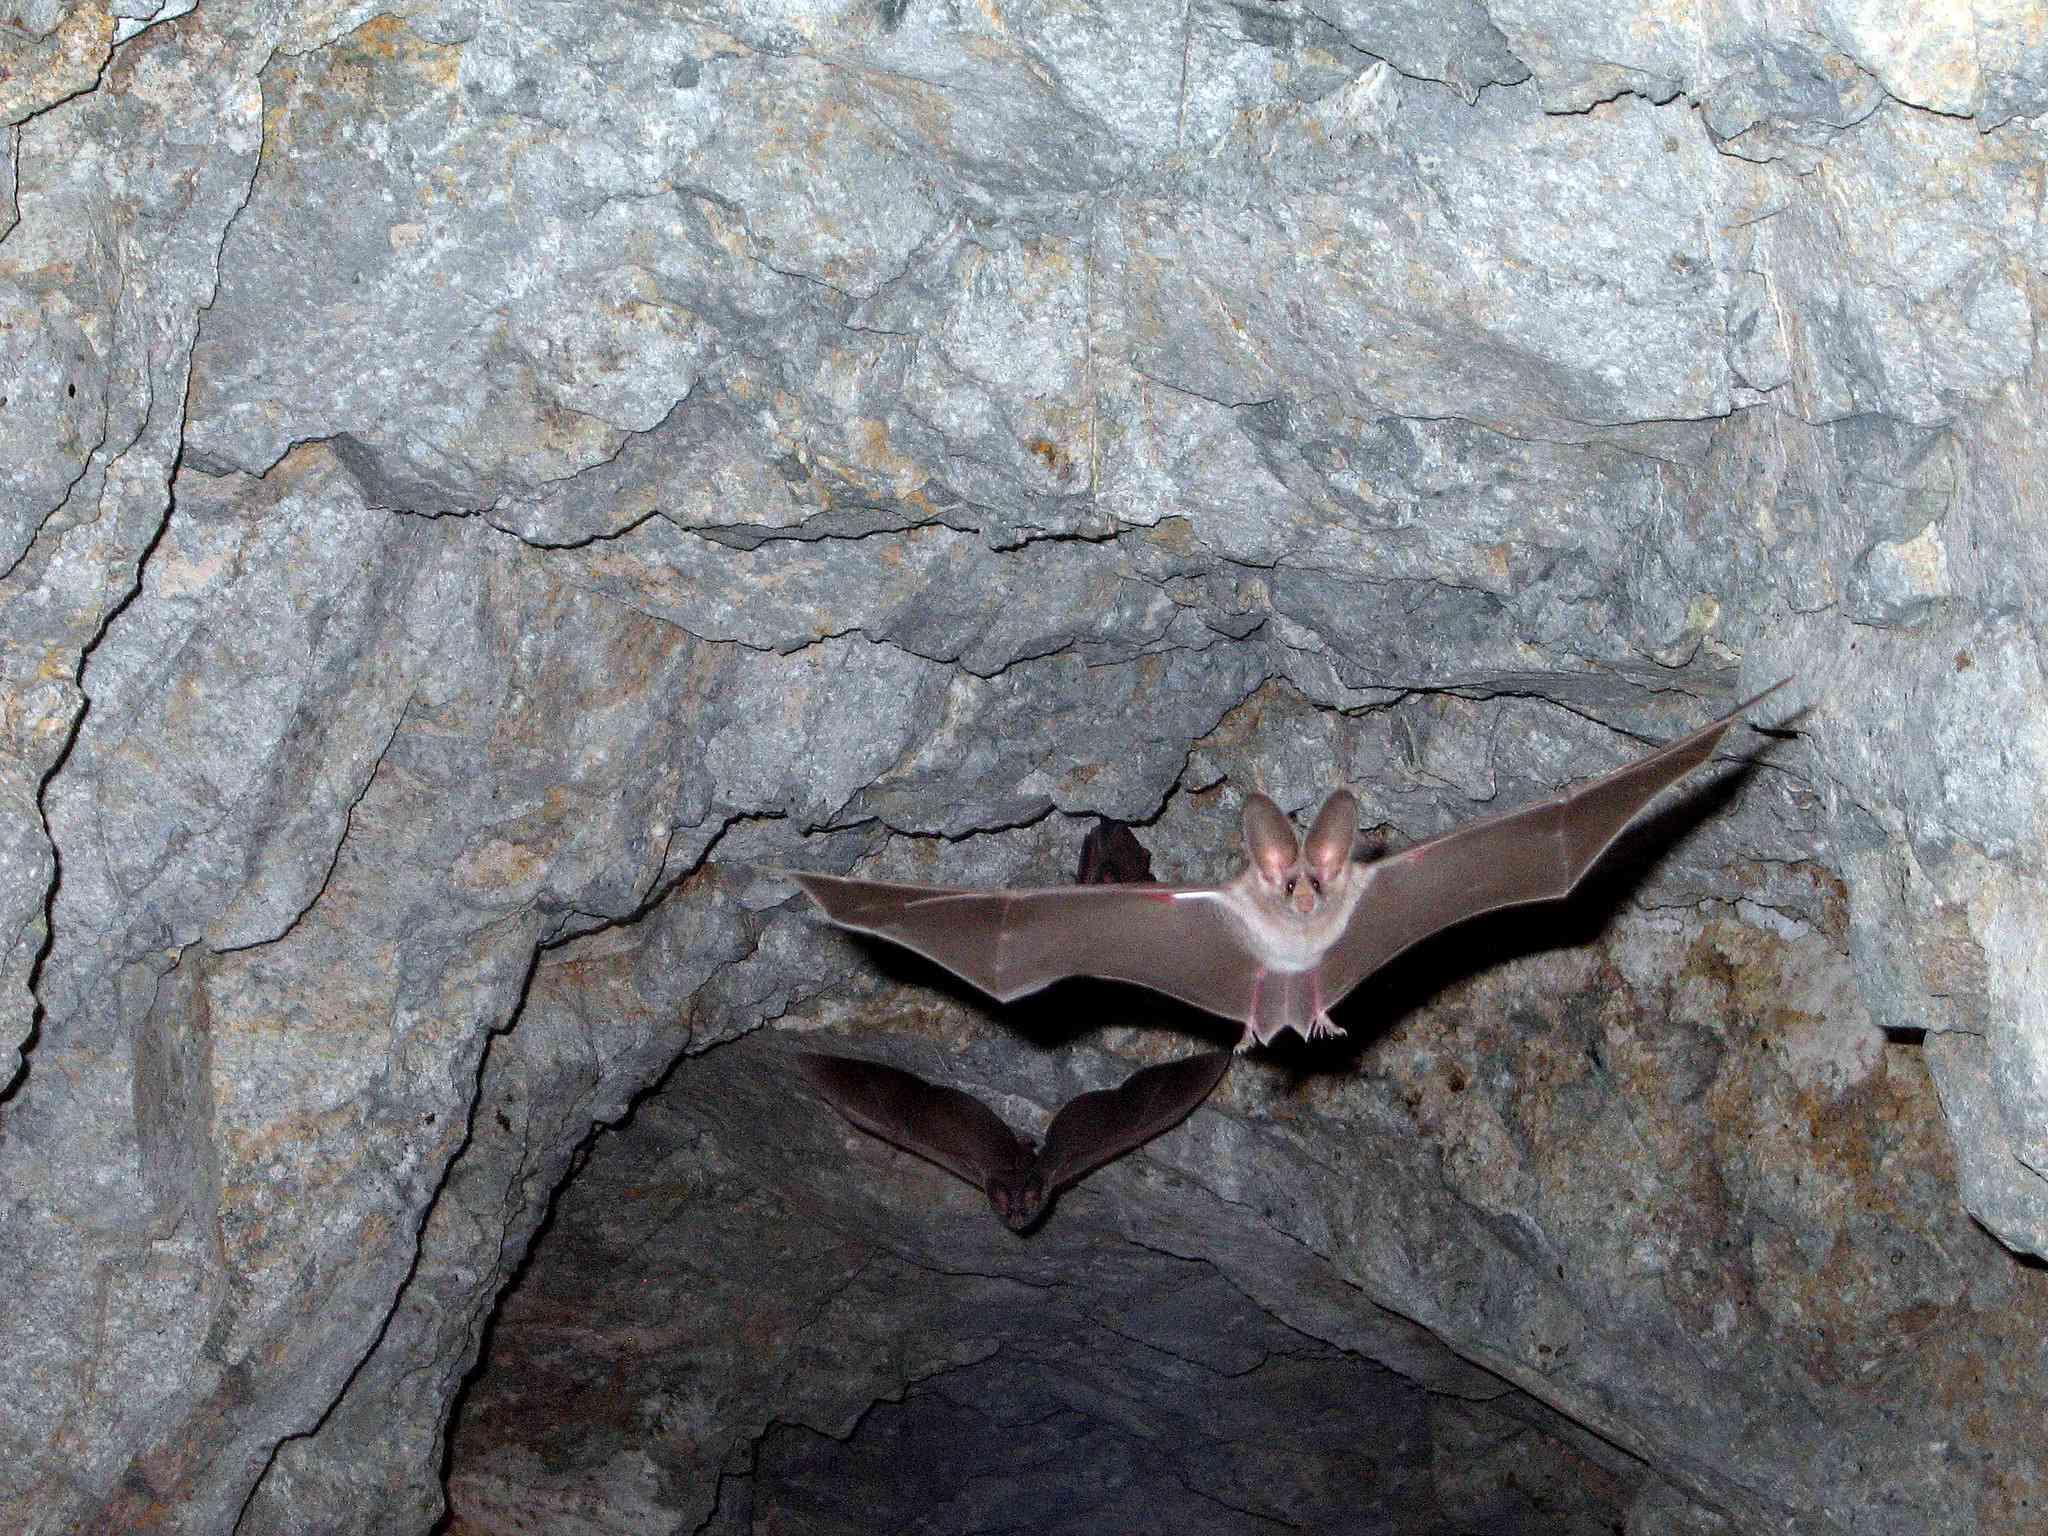 A leaf-nosed bat flies through a cave